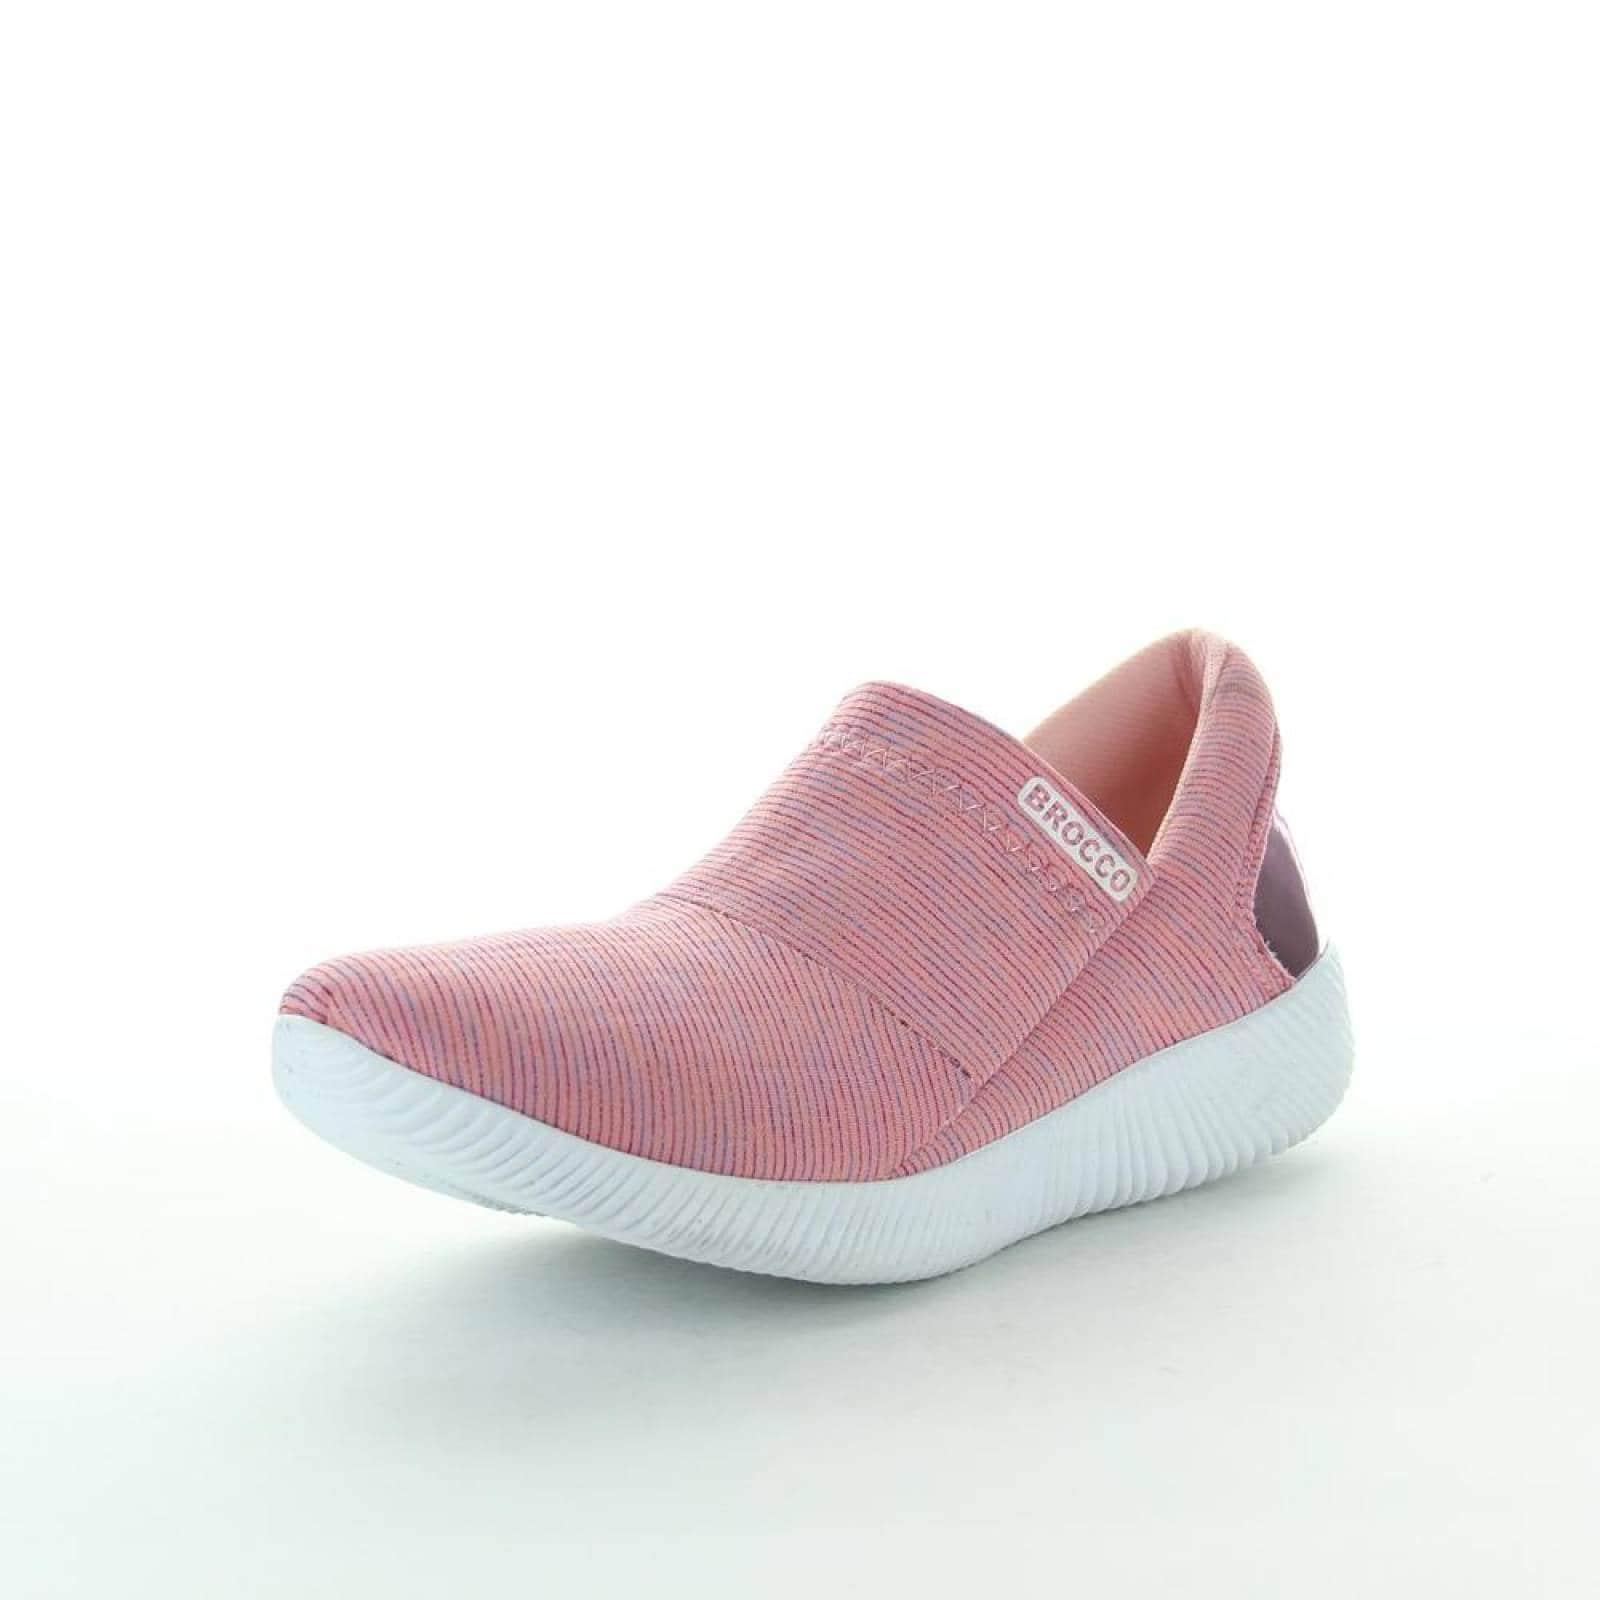 Tenis Brocco Mujer Rosa Textil 700